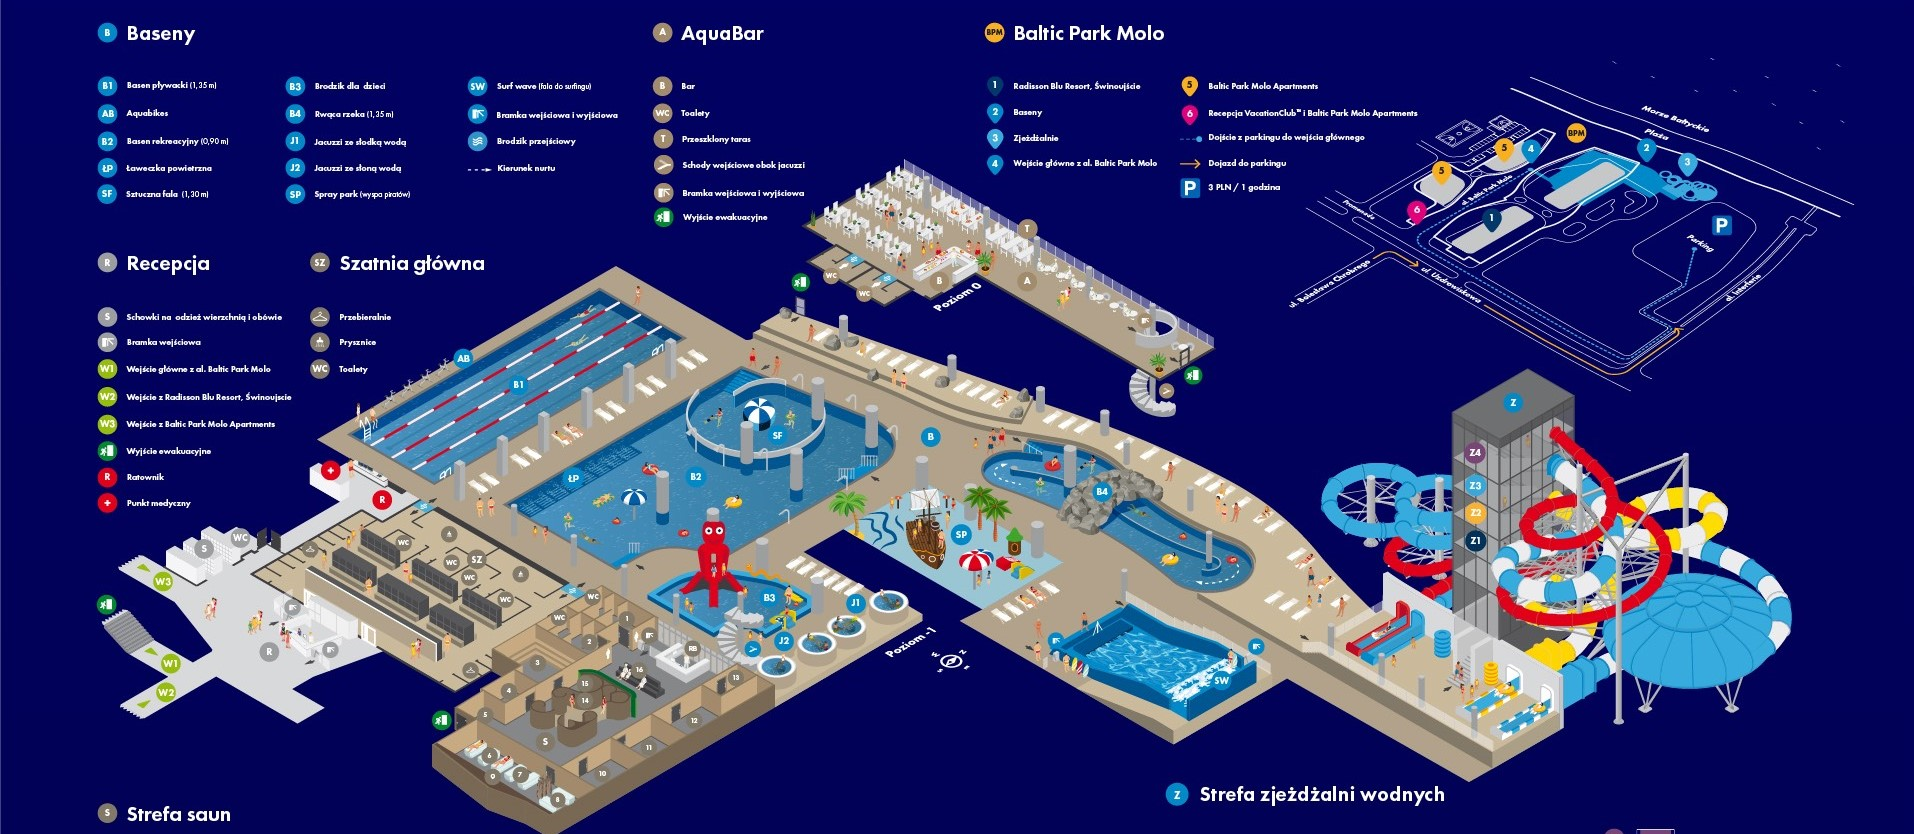 Baltic_Park_Molo_Aquapark_Swinoujscie